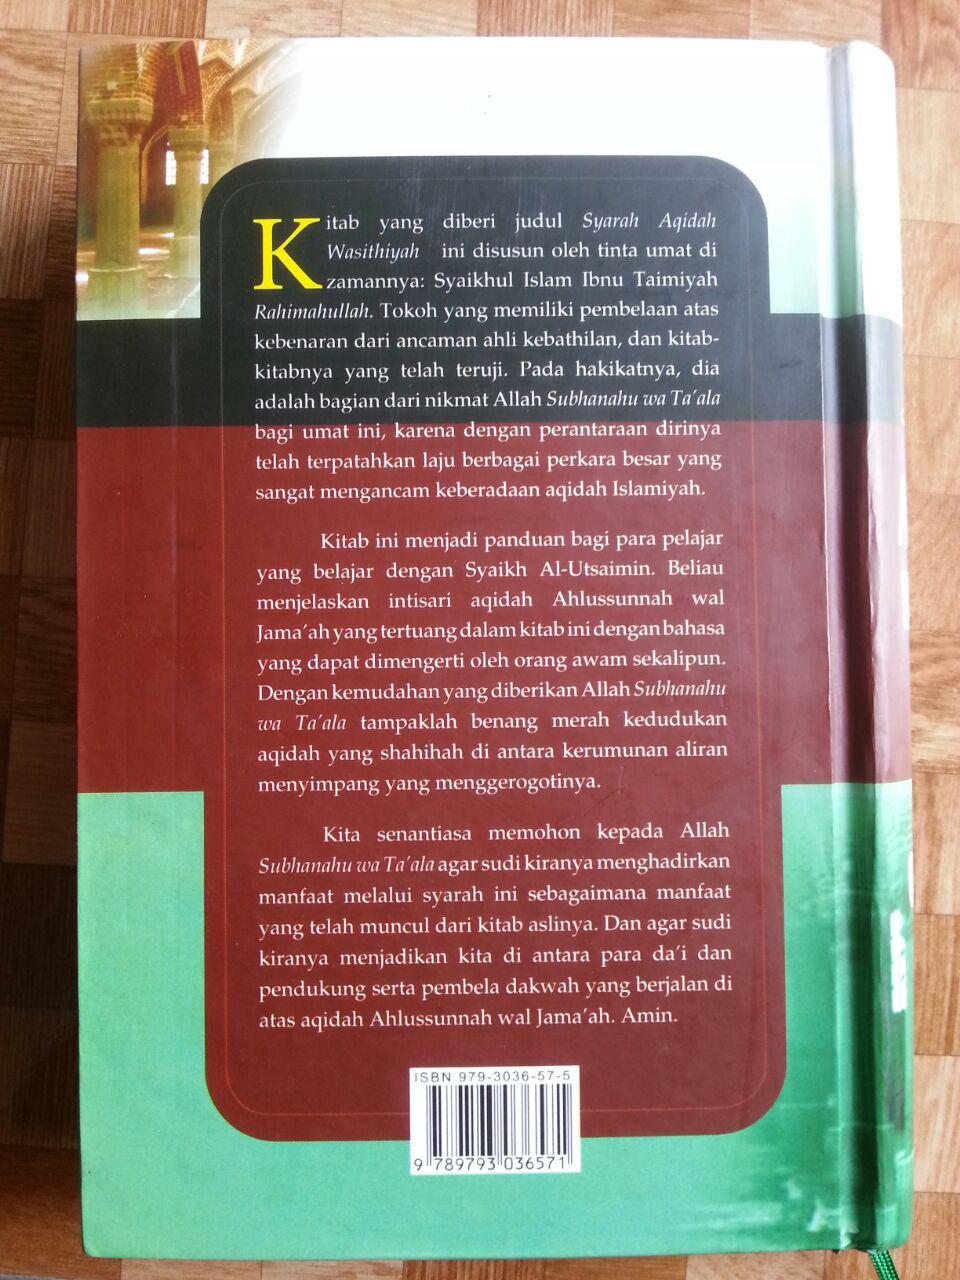 Buku Syarah Aqidah Wasithiyah cover